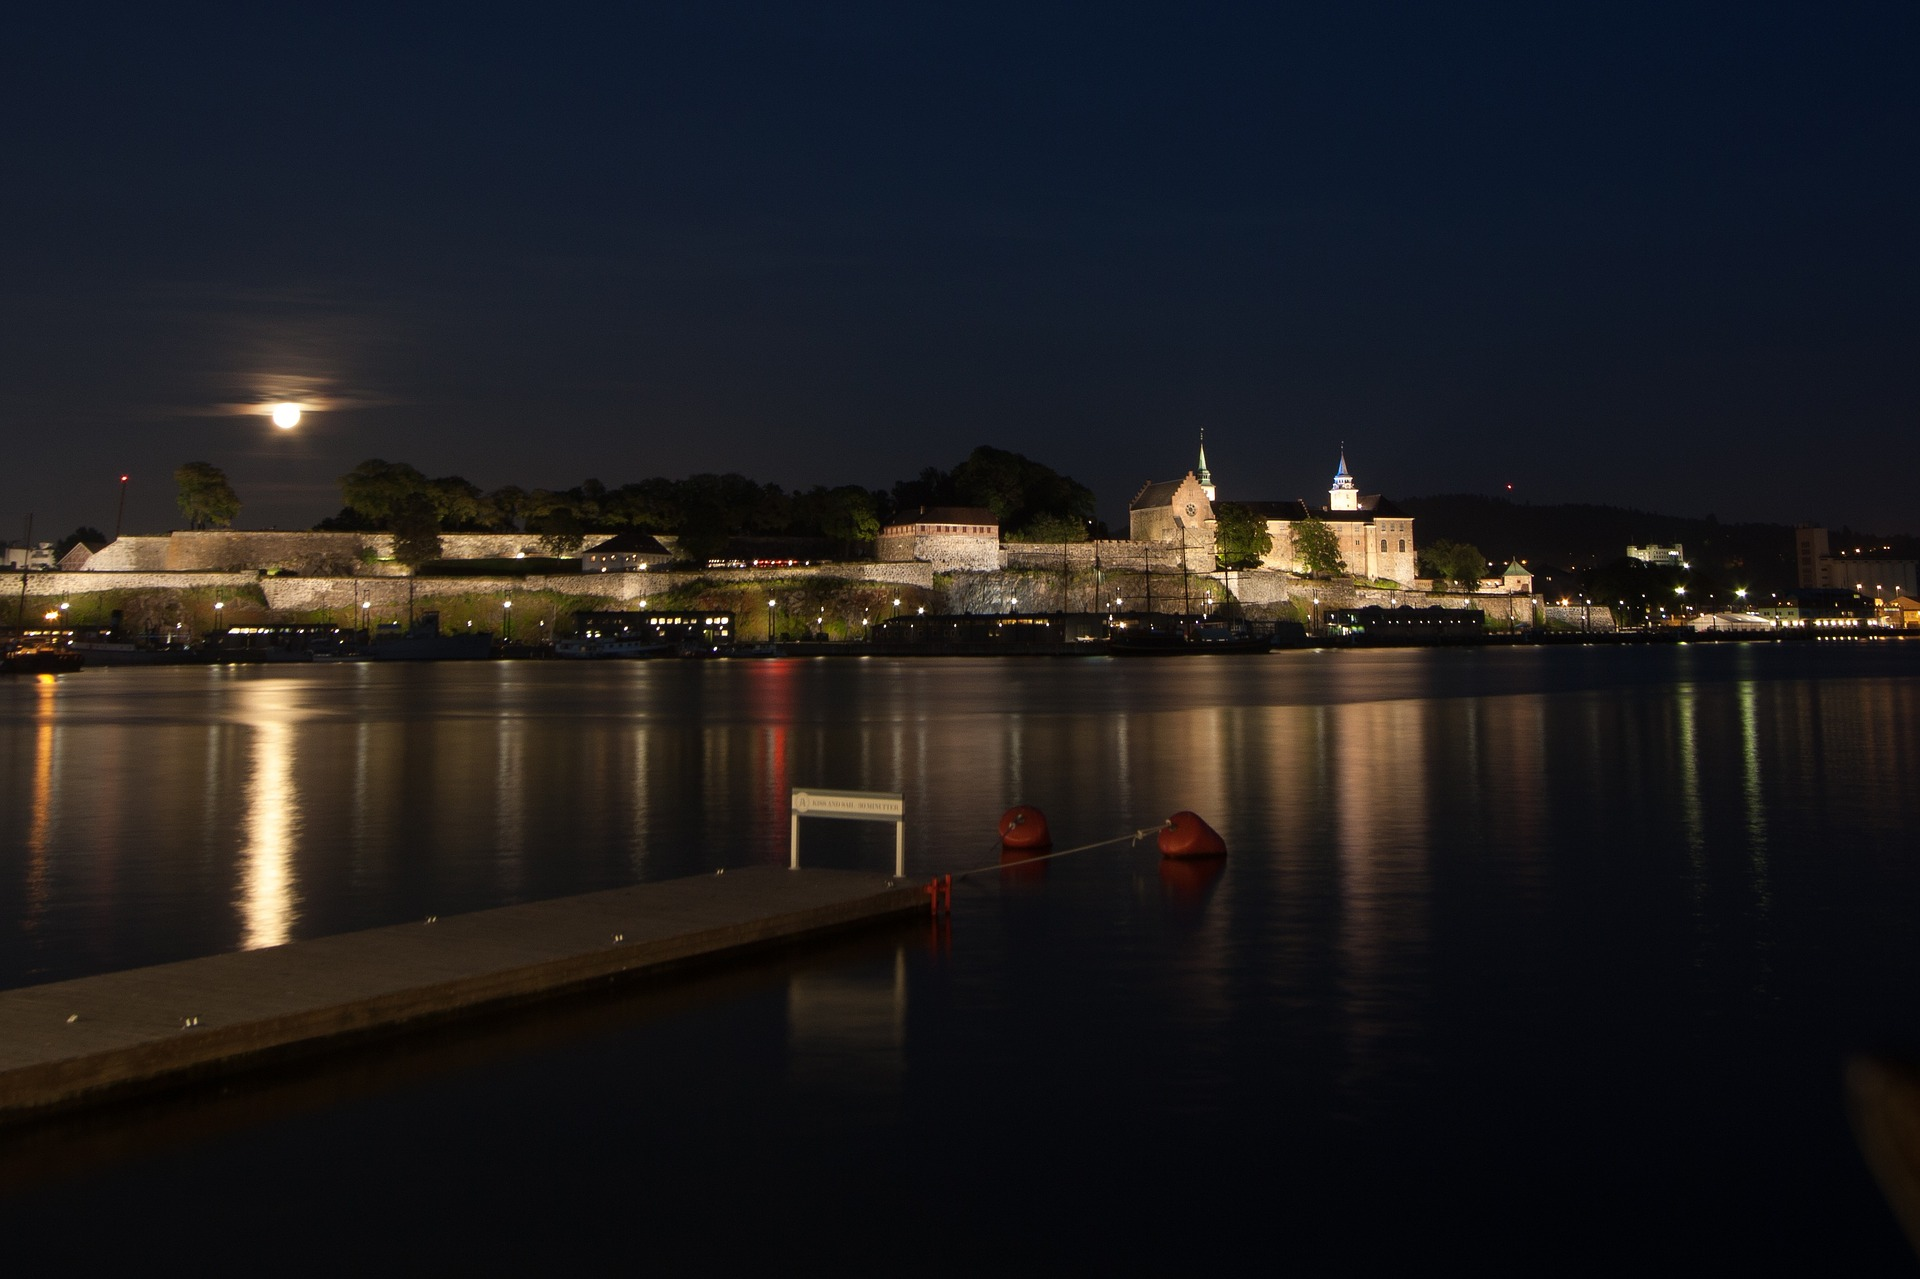 Night club in Norvegia, Oslo: i migliori locali notturni